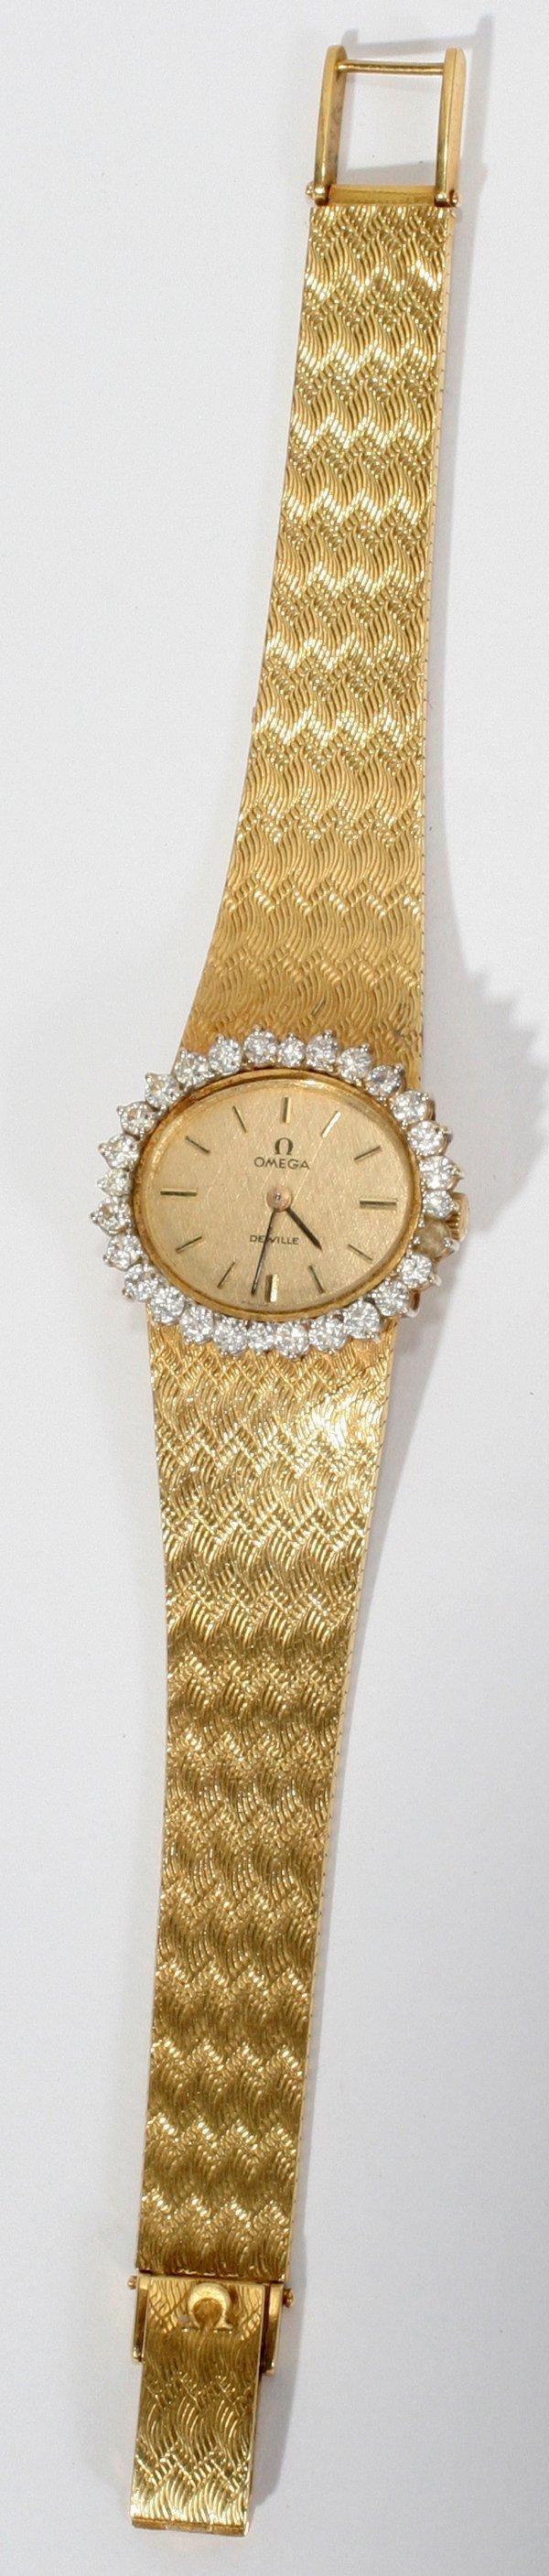 022181: OMEGA LADY'S 18 KT Y/GOLD & DIAMOND WRIST WATCH